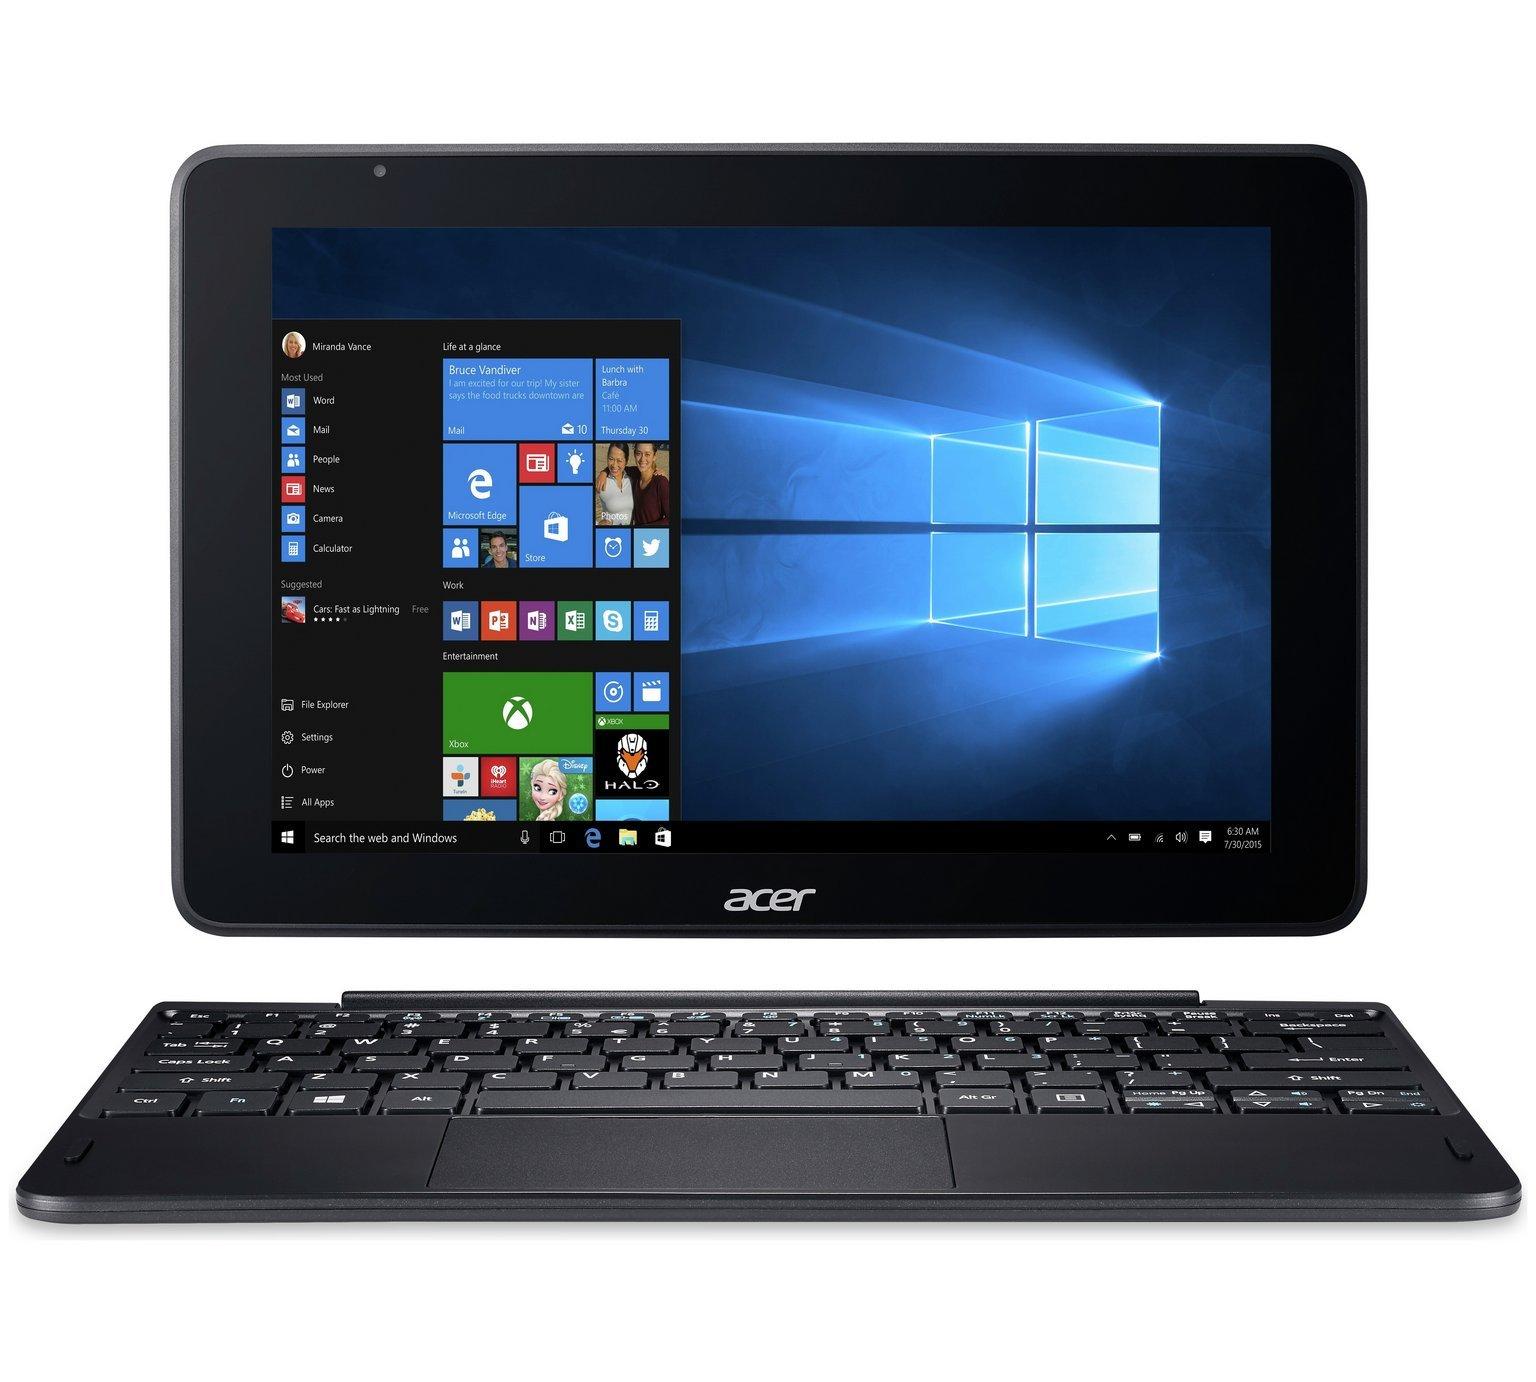 Acer One 10.1 Inch Intel Atom 2GB 64GB 2 in 1 Laptop - Black